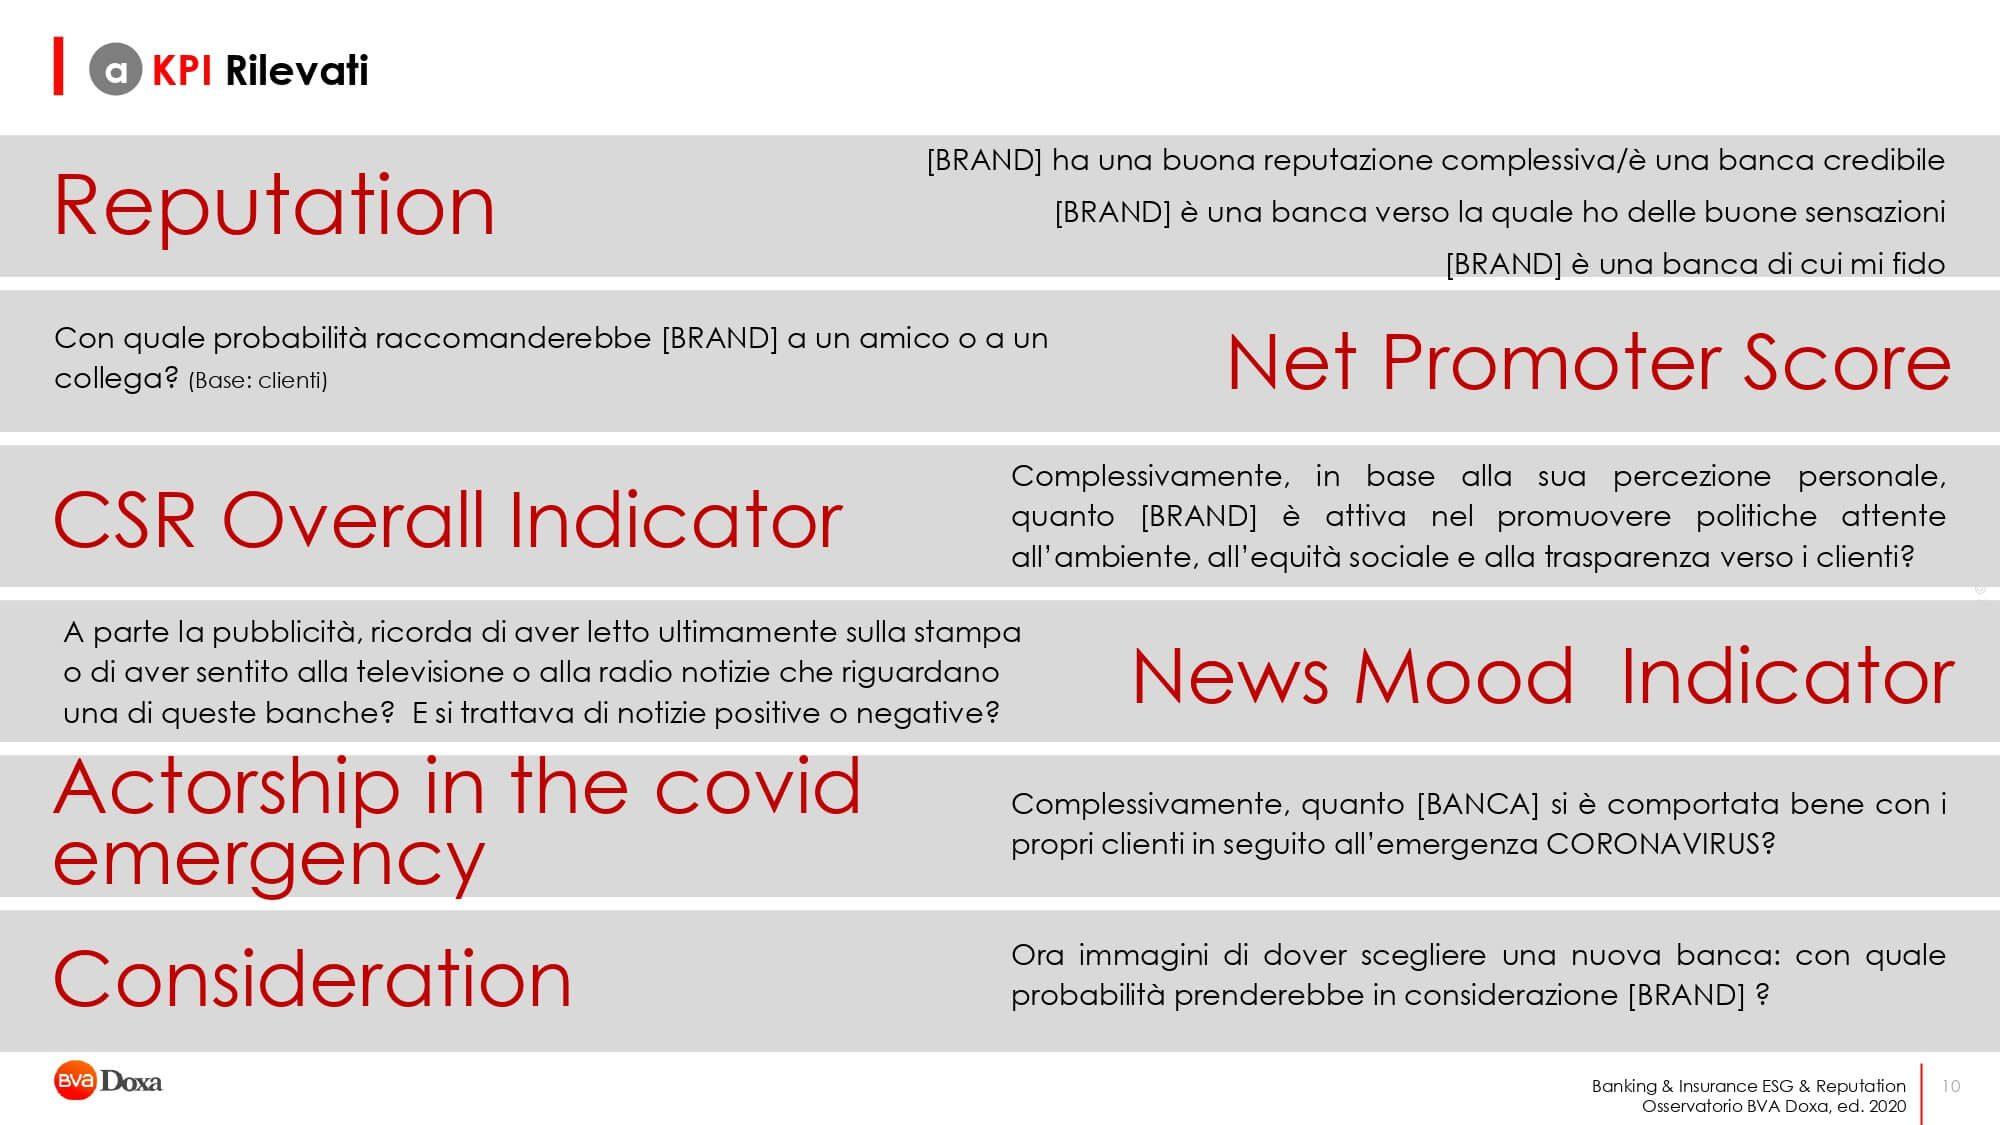 Bva Doxa Banking & Insurance Esg & Reputation Page 0010